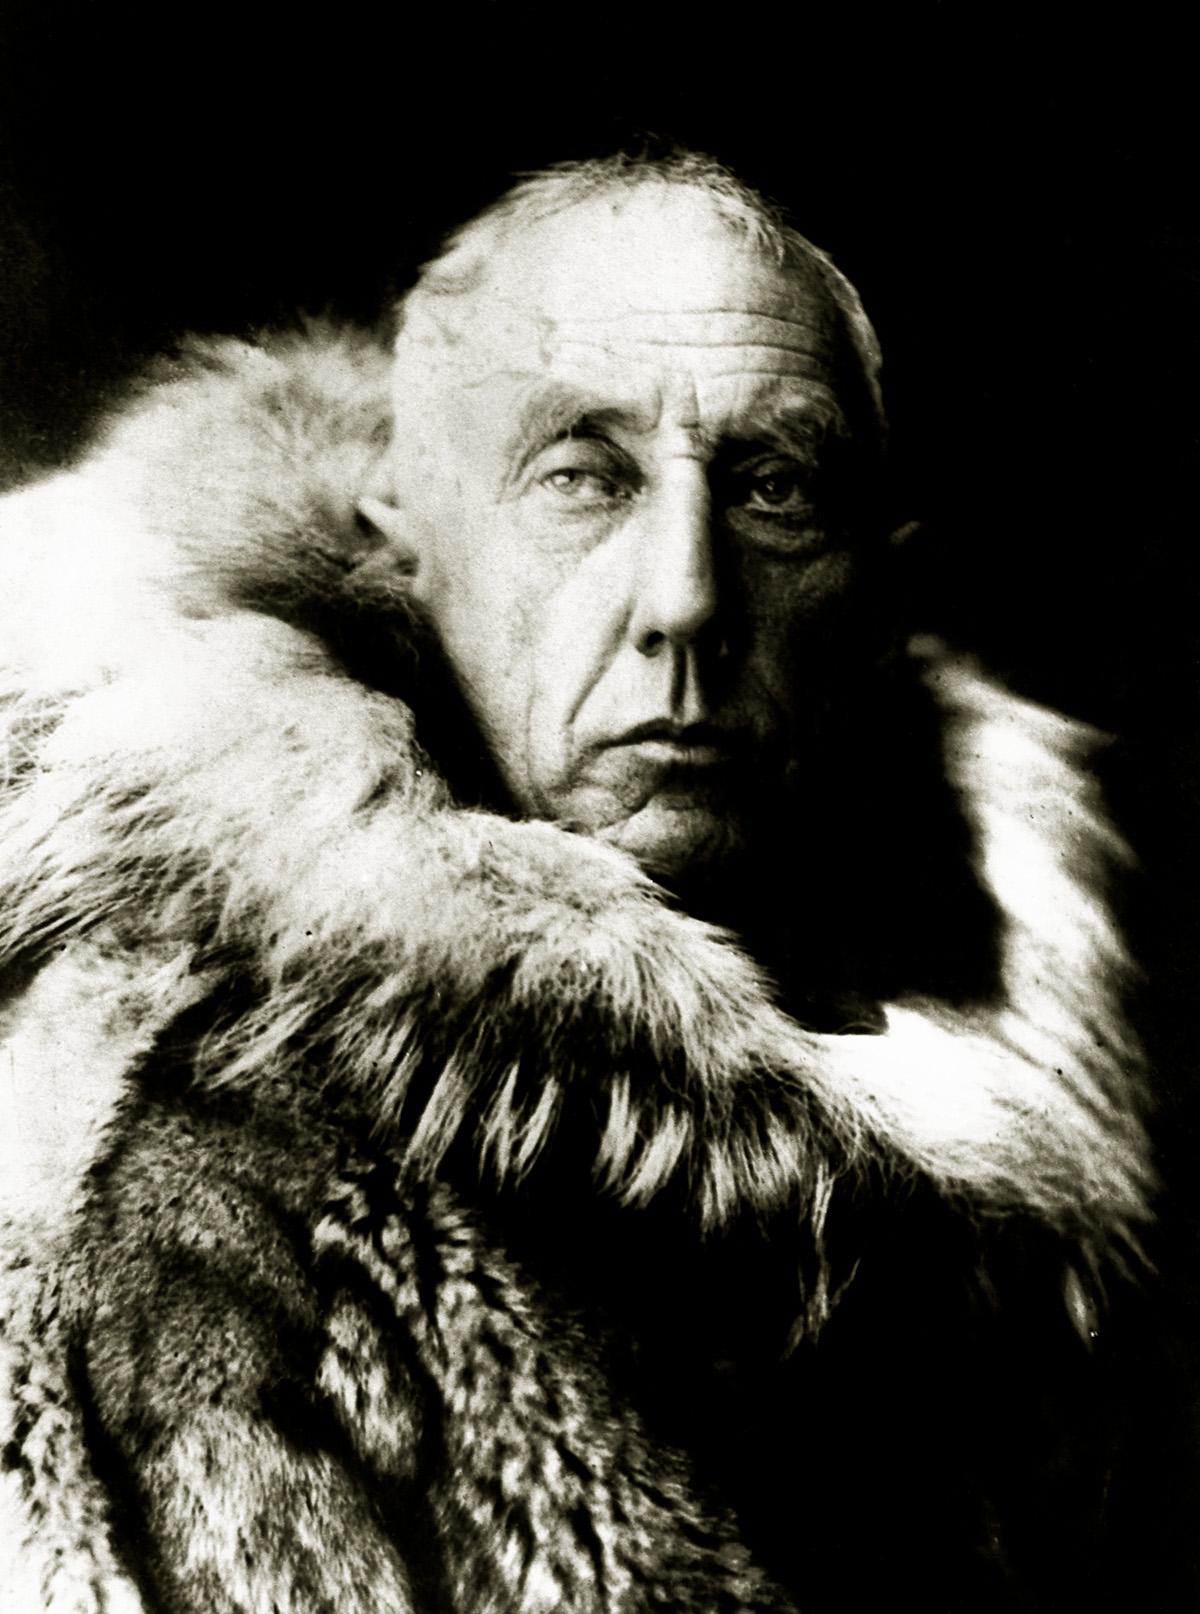 data-cke-saved-src=https://bilimgenc.tubitak.gov.tr/sites/default/files/amundsen2.jpg